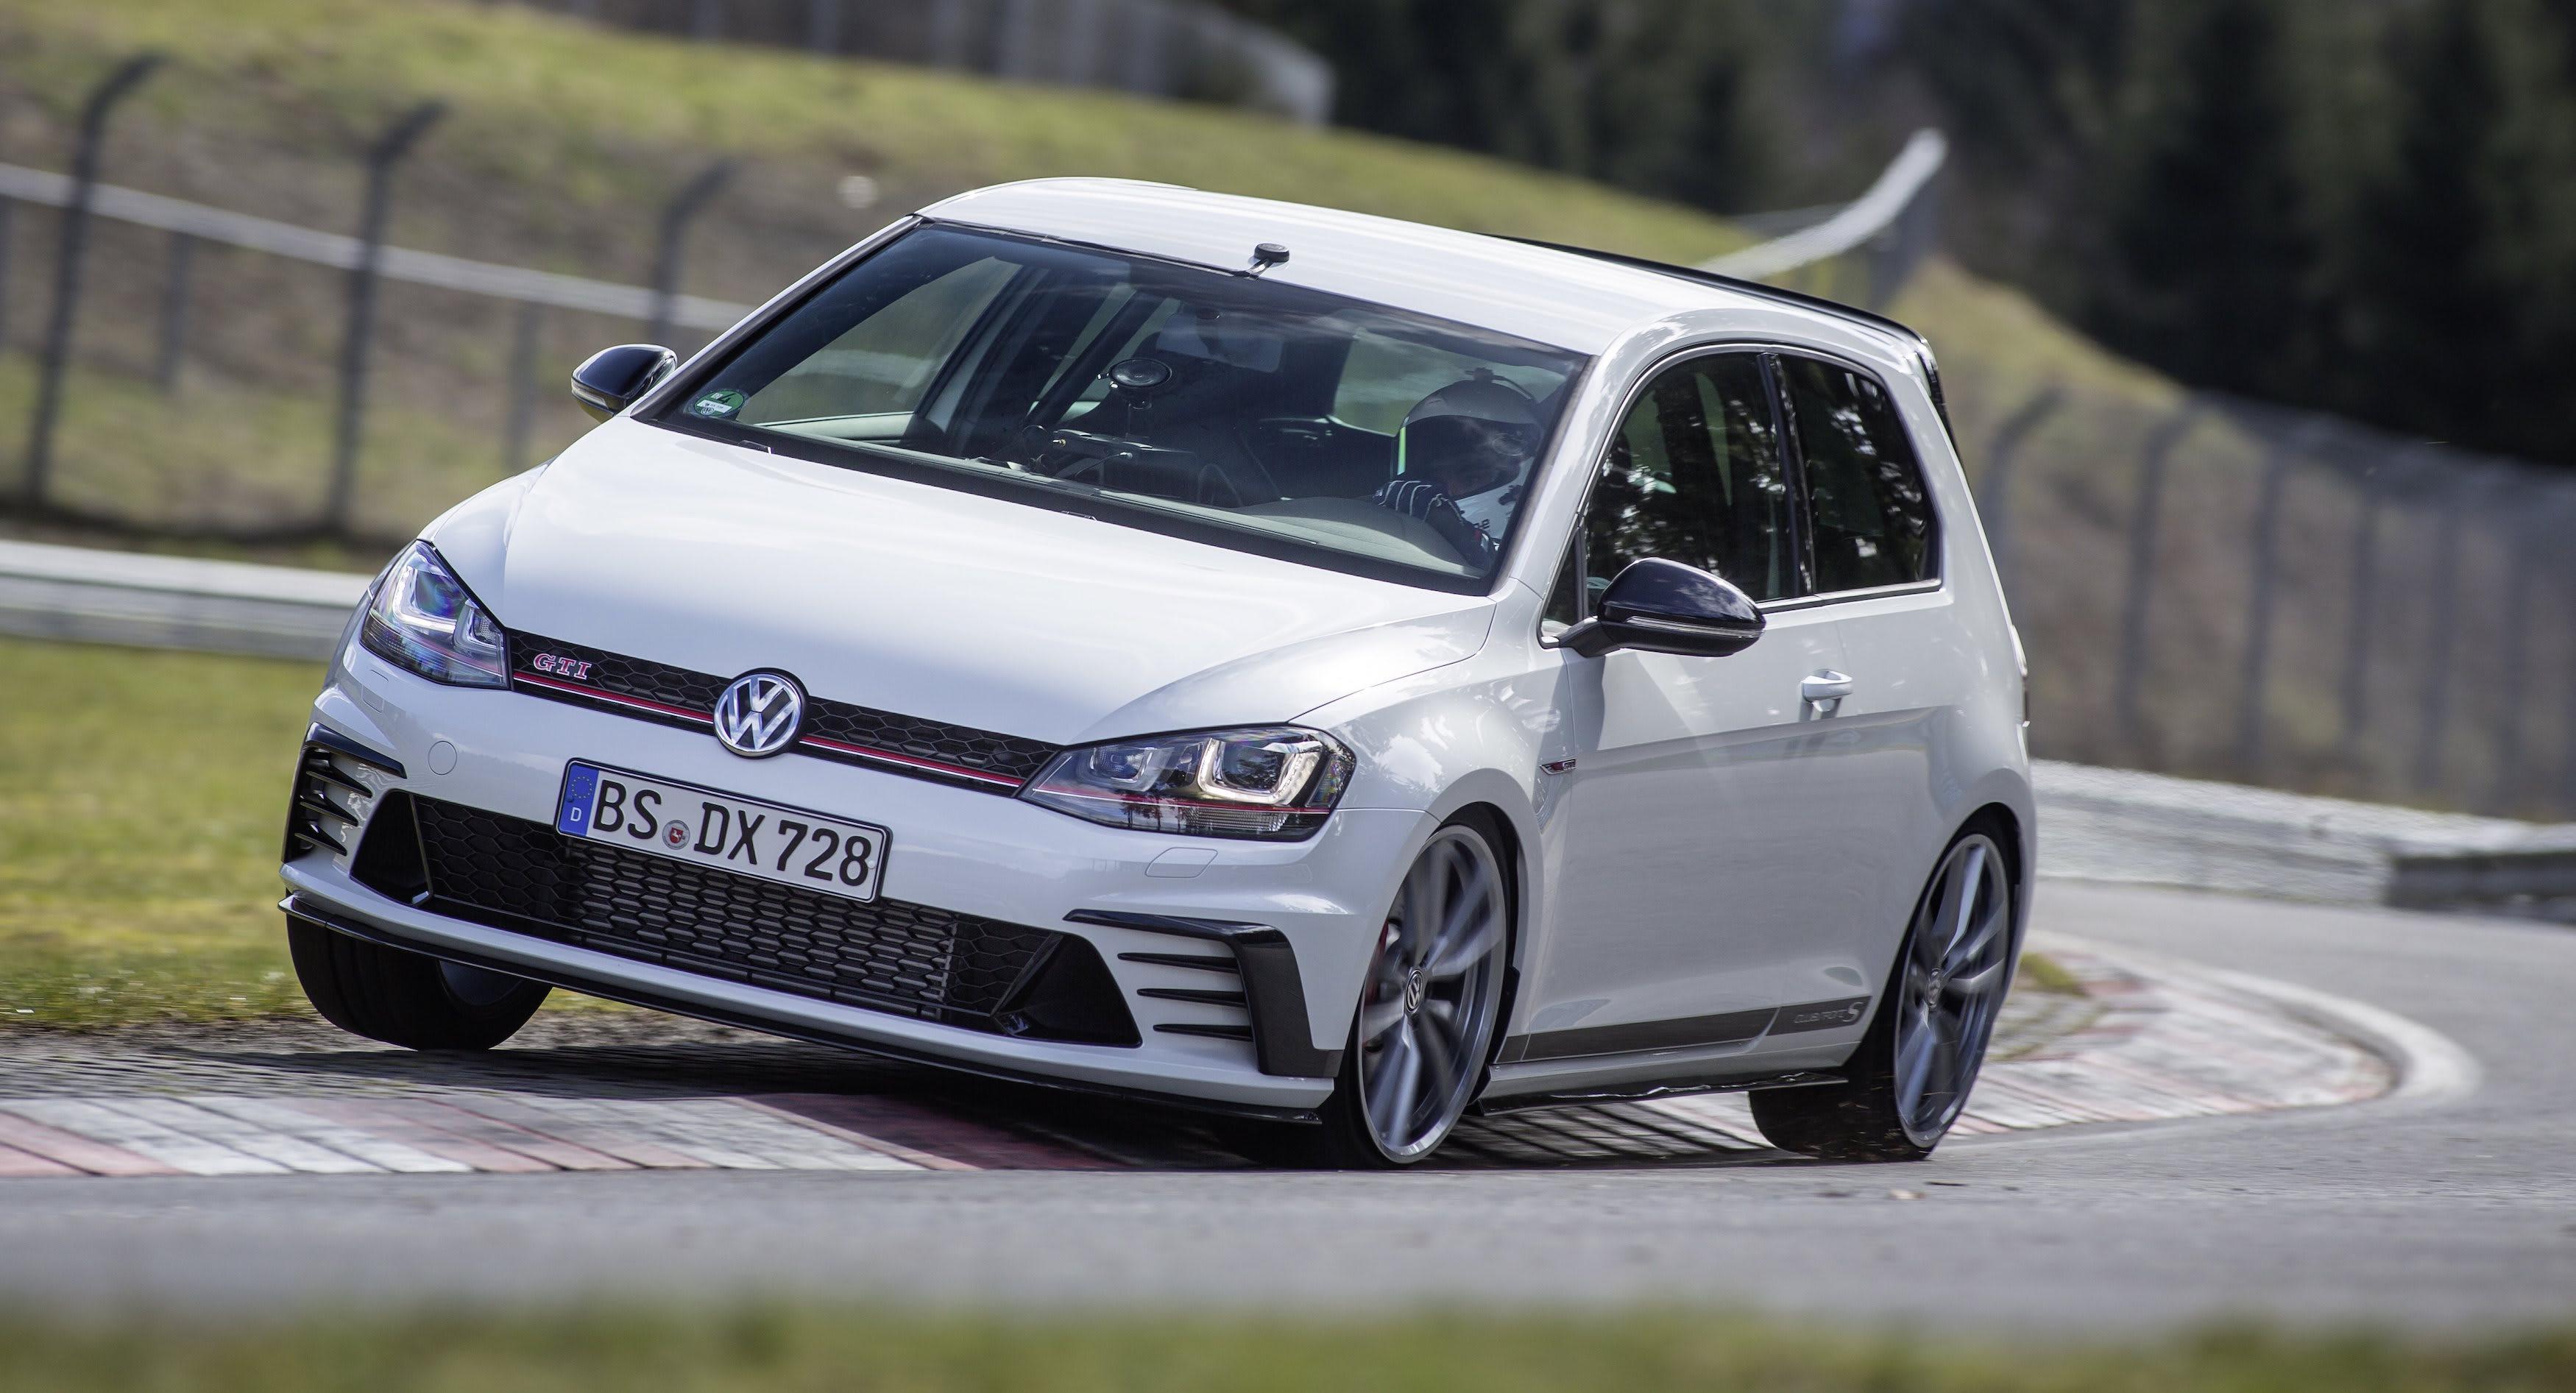 2017 Volkswagen Golf GTI Clubsport S Nurburgring4